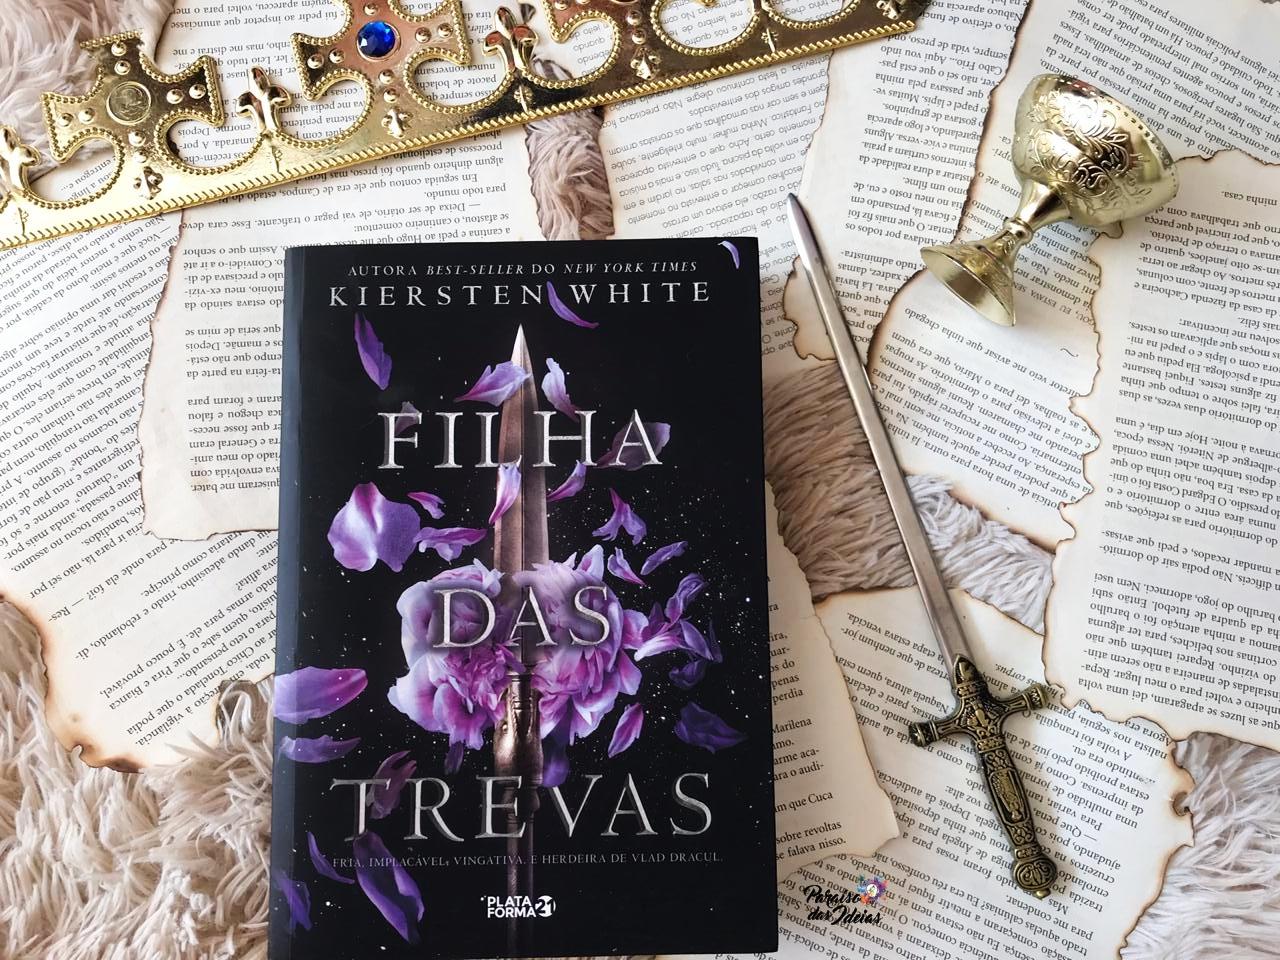 Filha das Trevas - Saga da Conquistadora #01 || Kiersten White